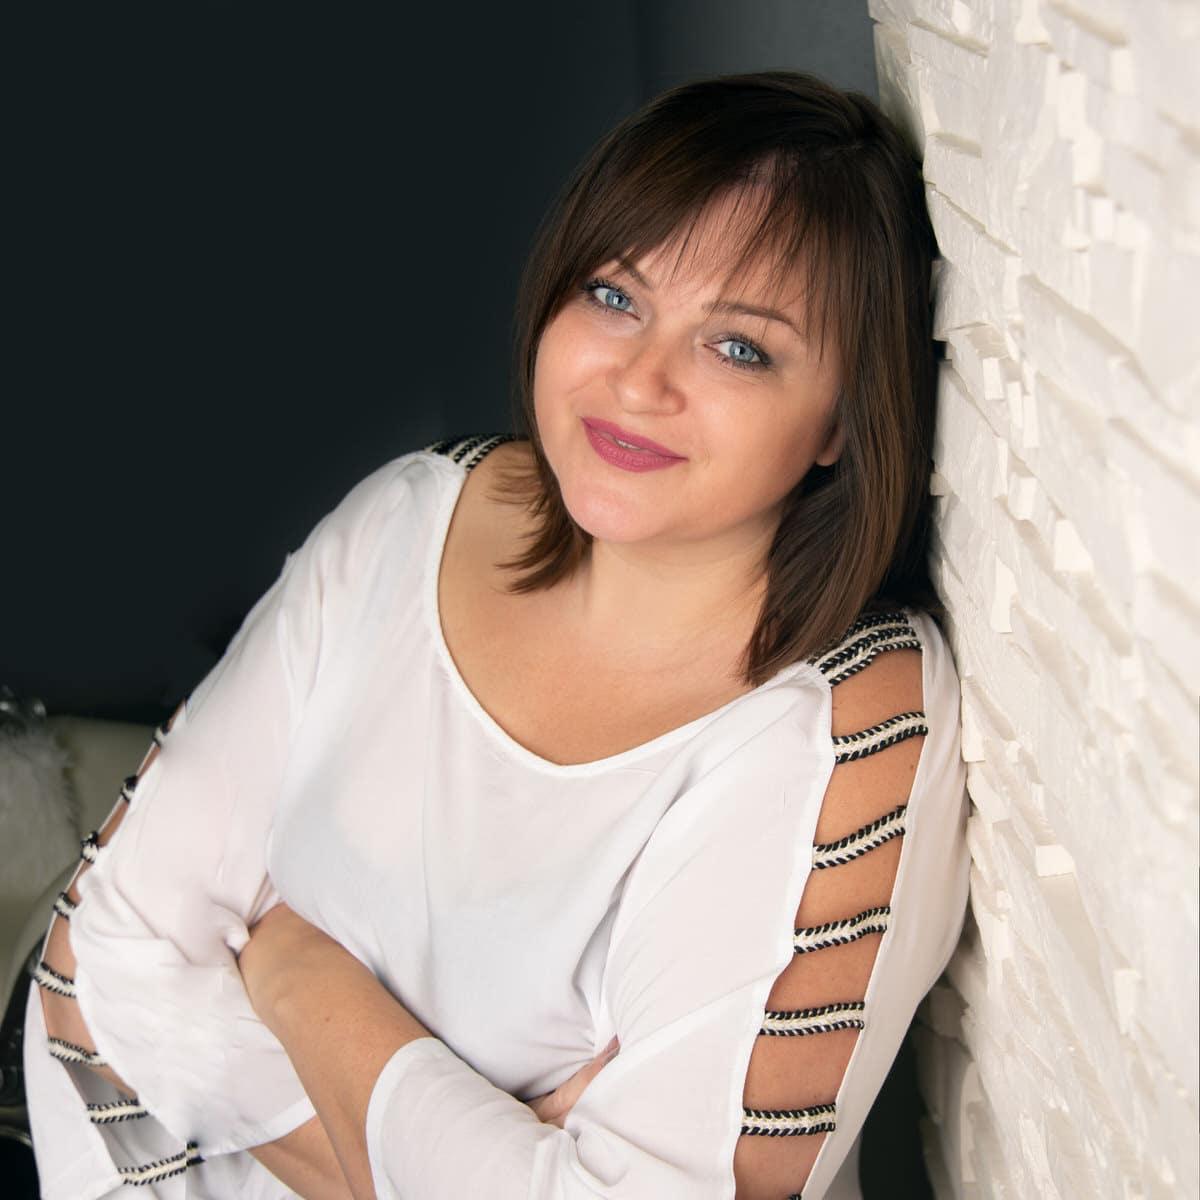 Alesia Ramhofer